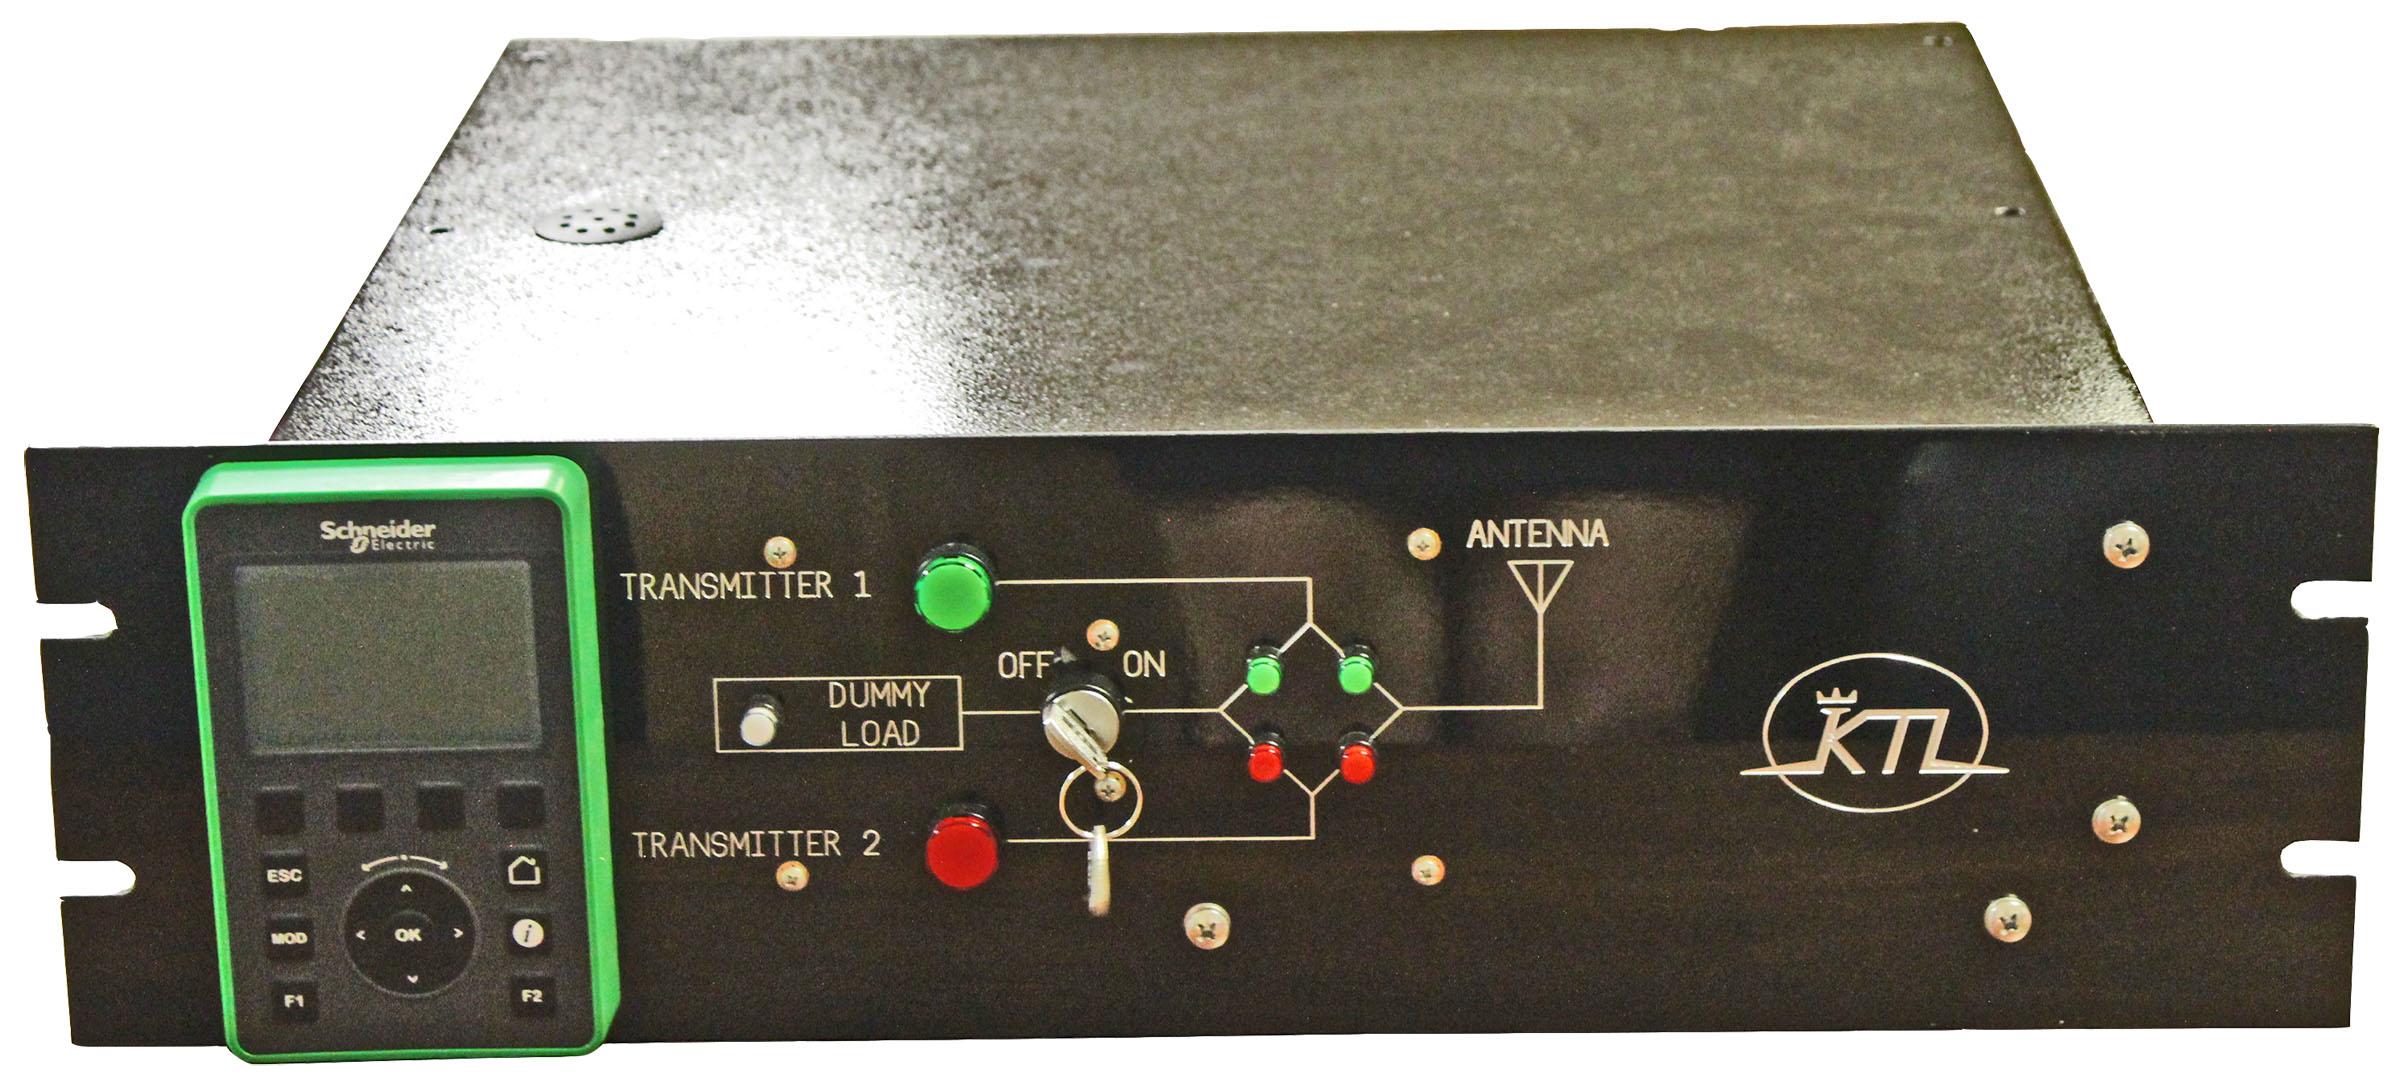 Kintronic Am Fm Tv Main Standby Transmitter Controller Sonifex Pty Ltd Sw Active Antenna Circuit